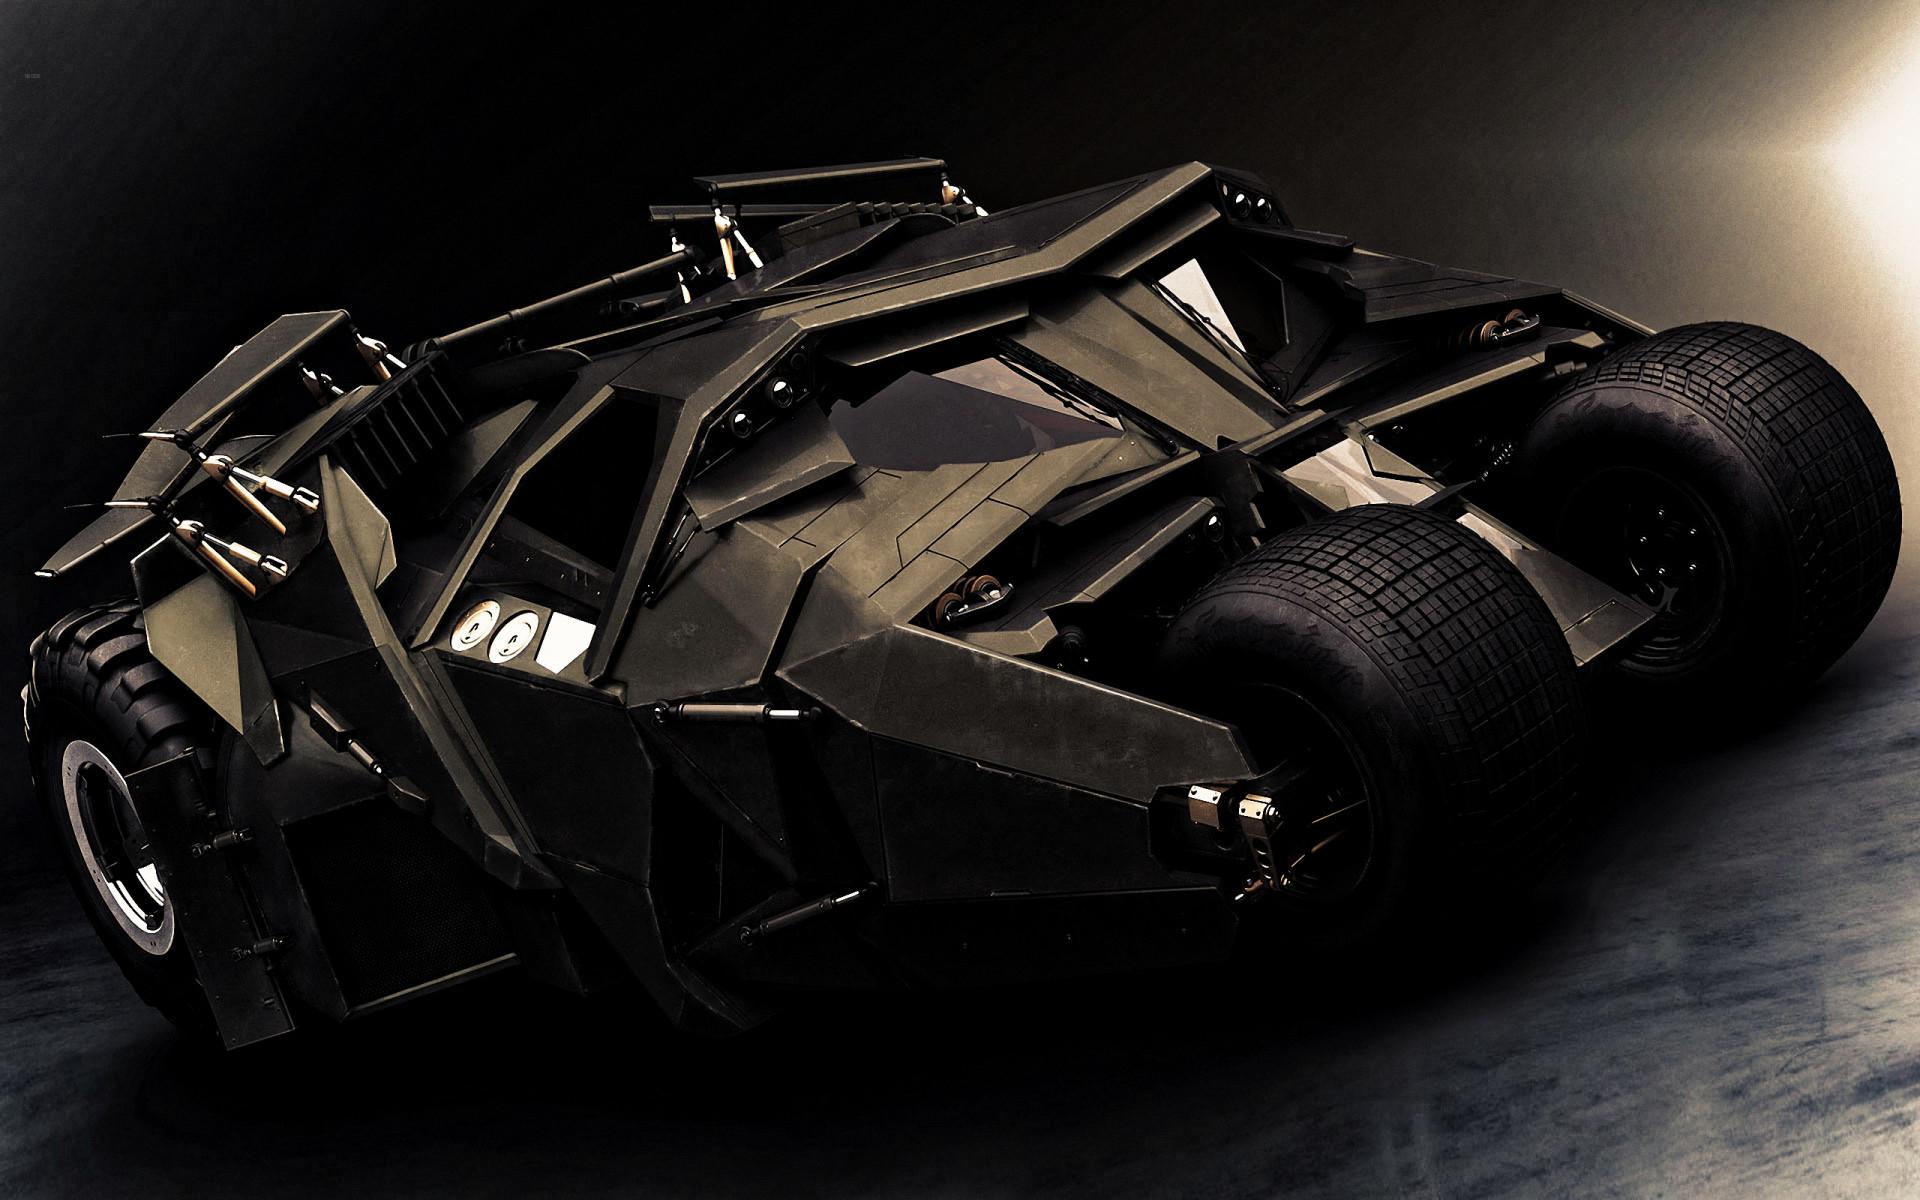 Batman The Dark Knight Car Wallpaper Batmobile Tumbler Wallpaper 183 ①